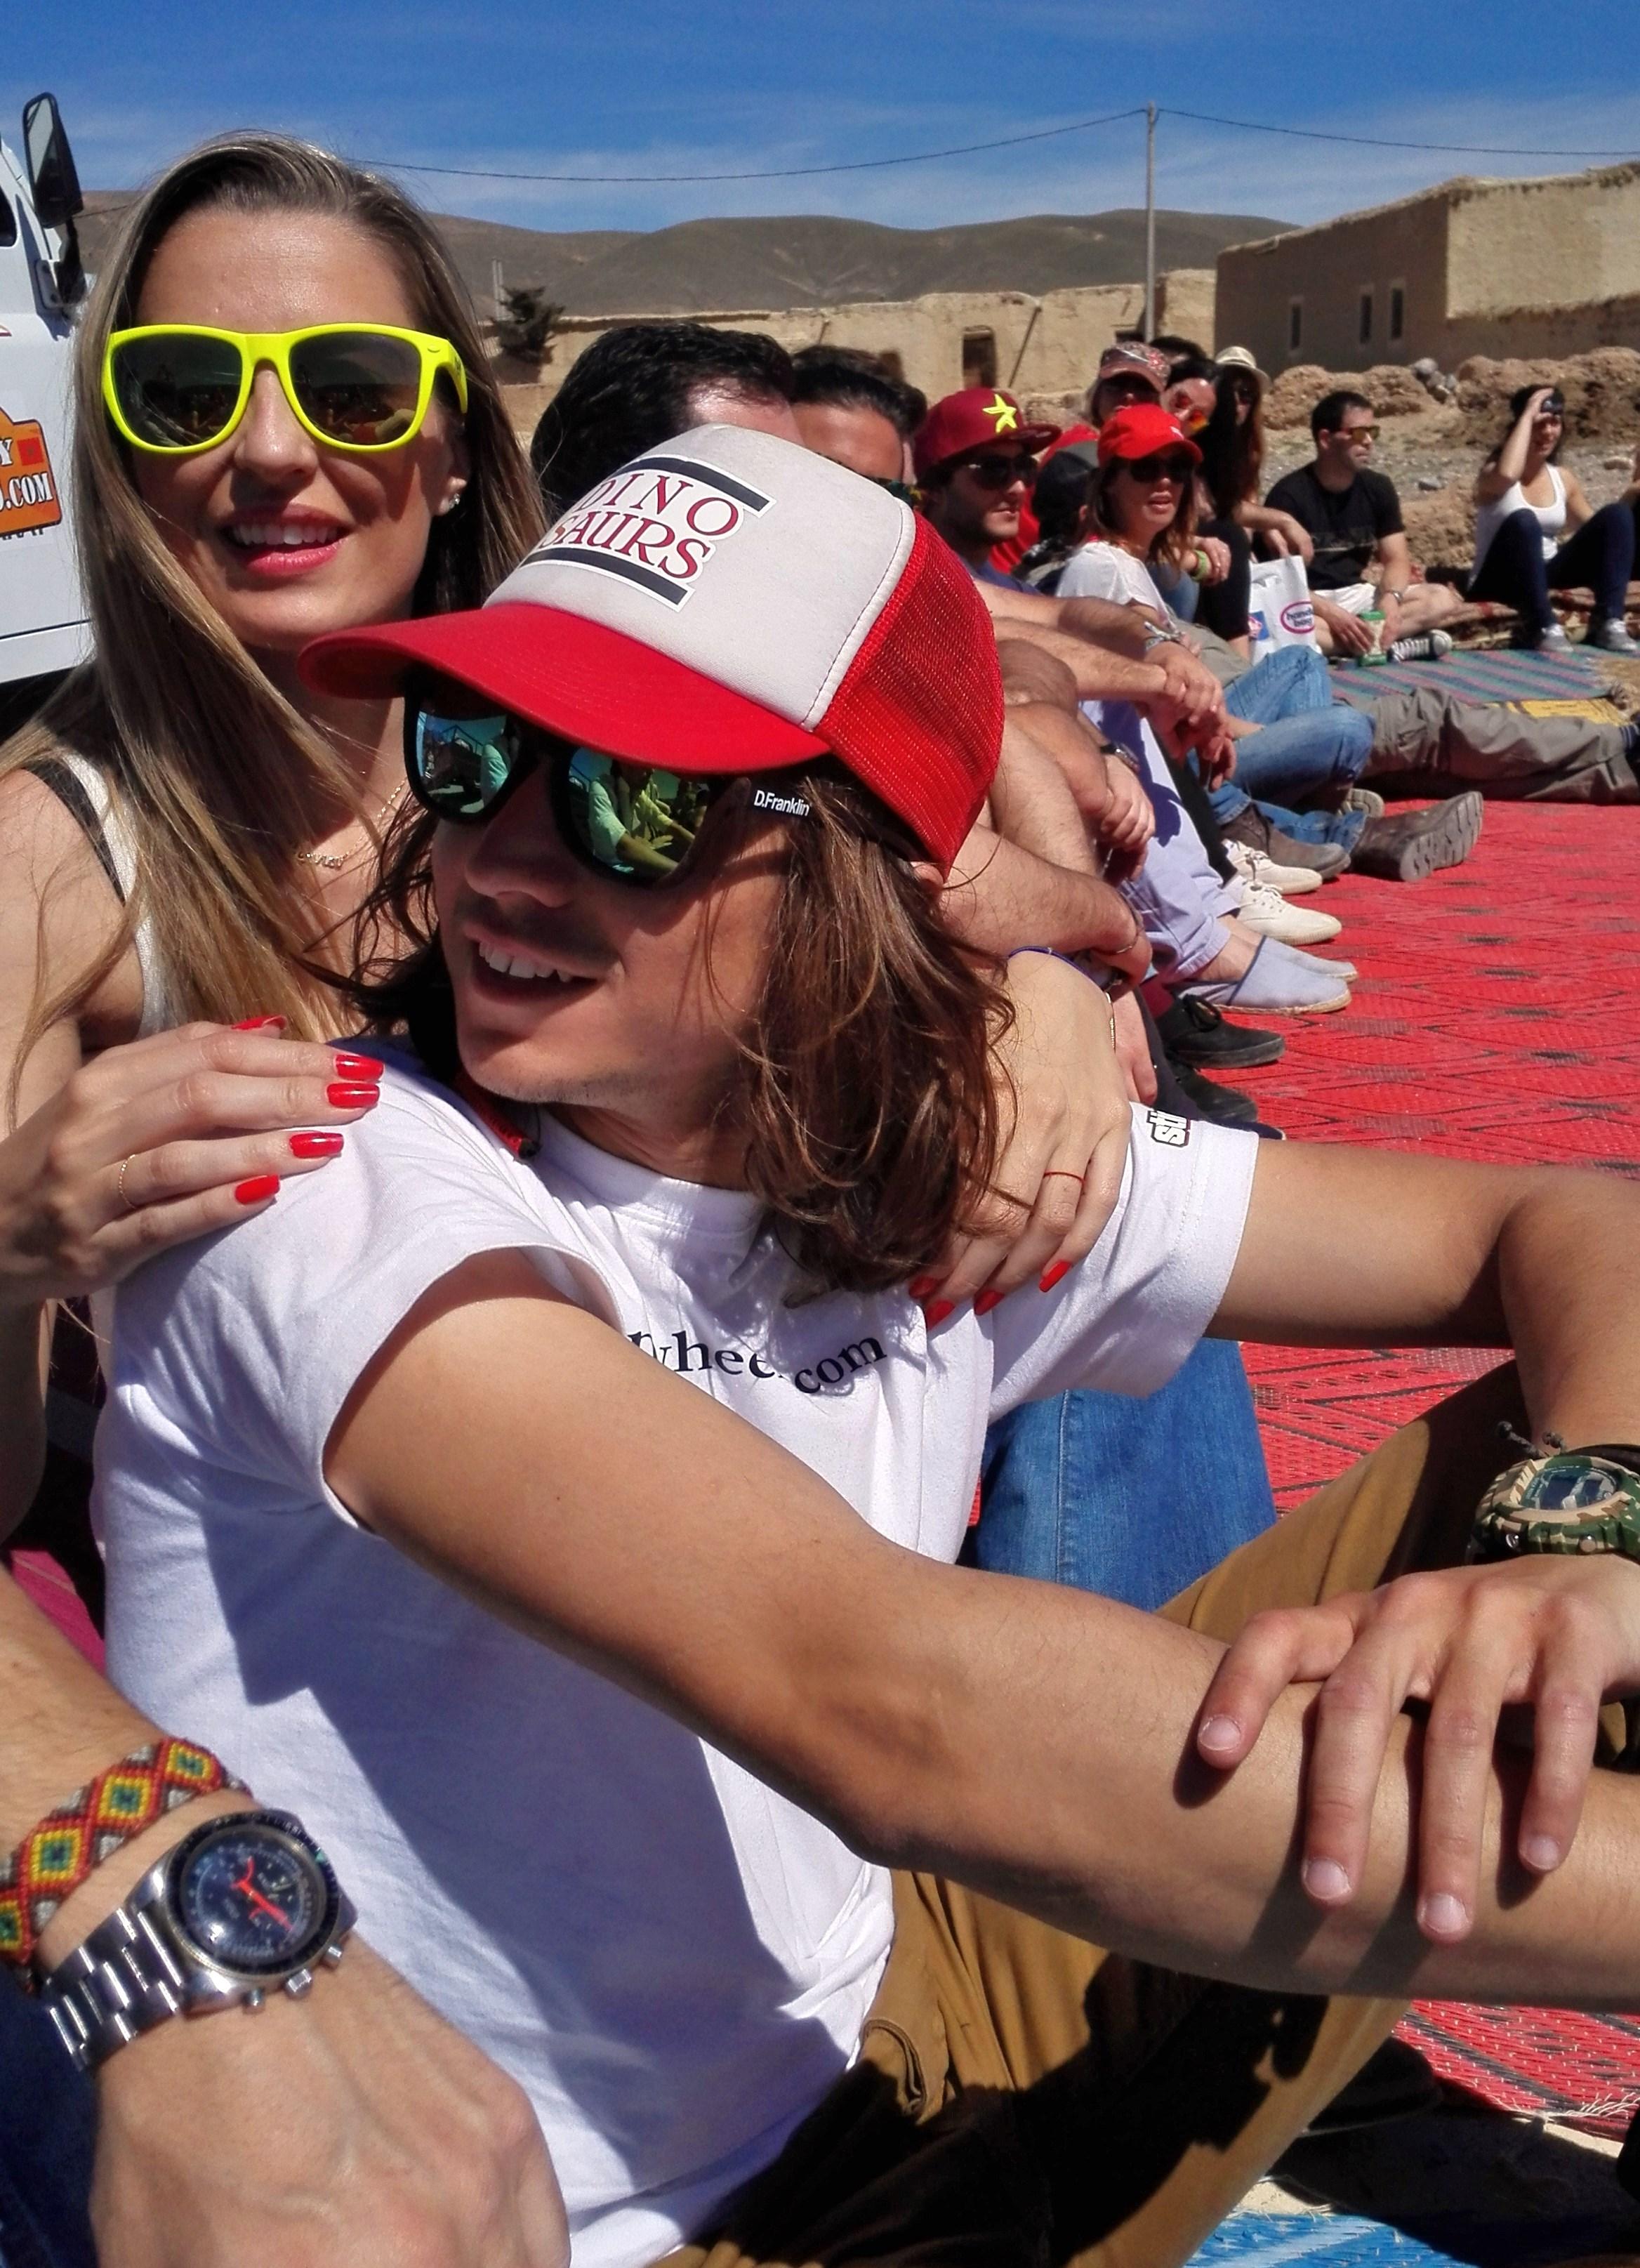 Rally_Solidario_Bymyheels_Lara_Martin_Gilarranz